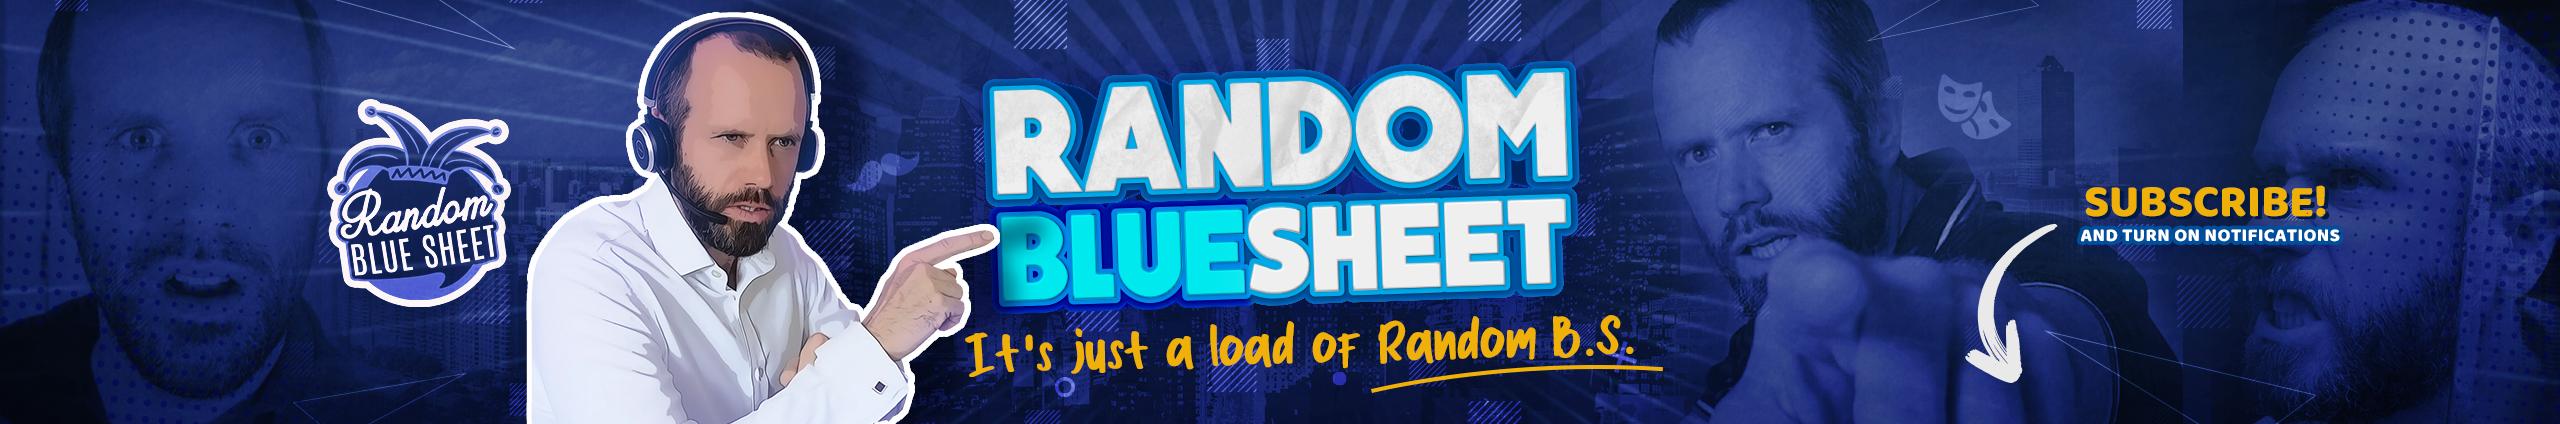 random-blue-sheet